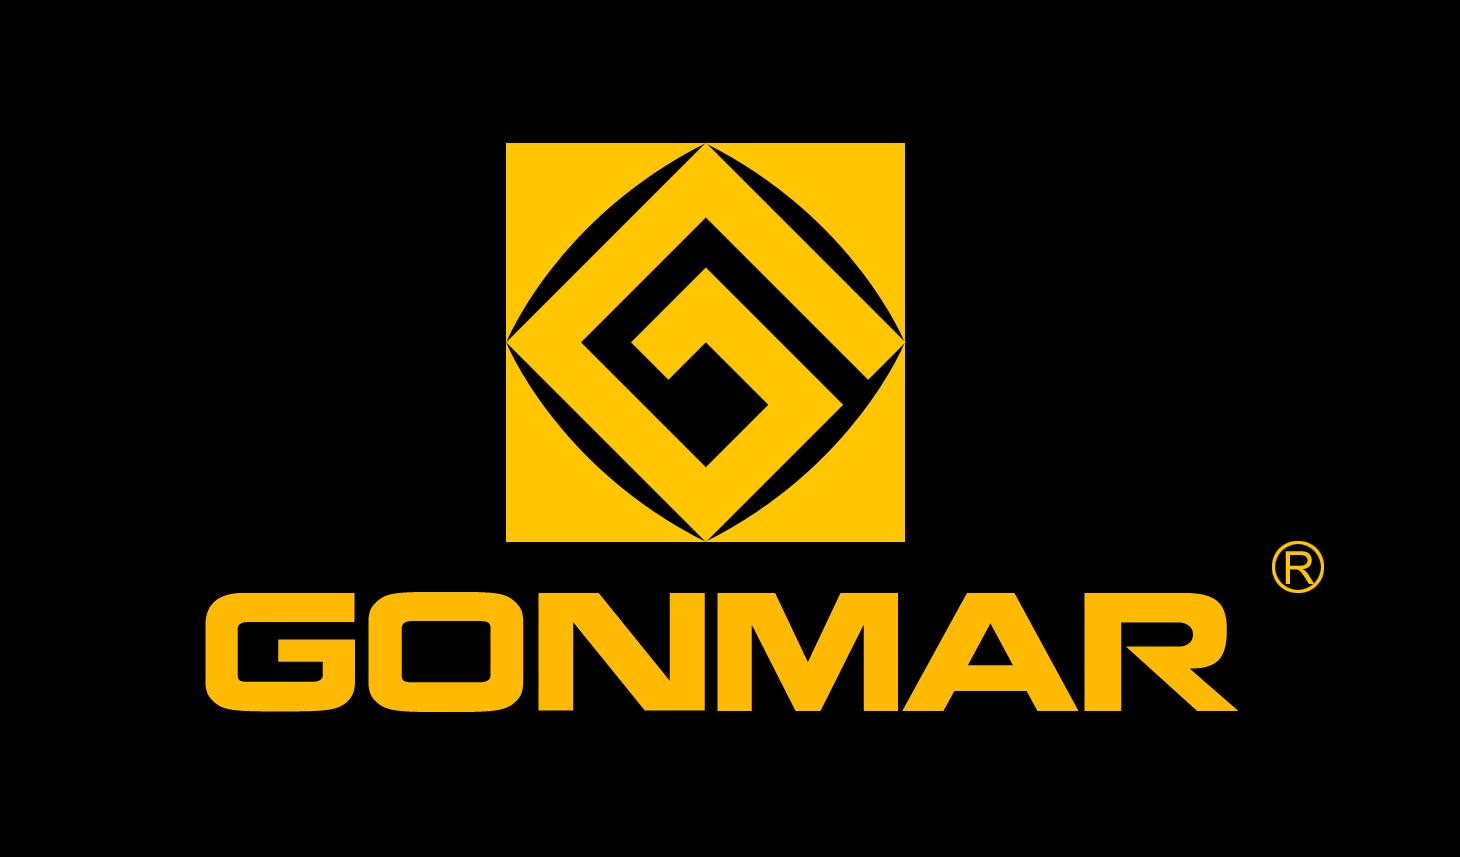 GONMAR(XIAMEN)TRADING CO